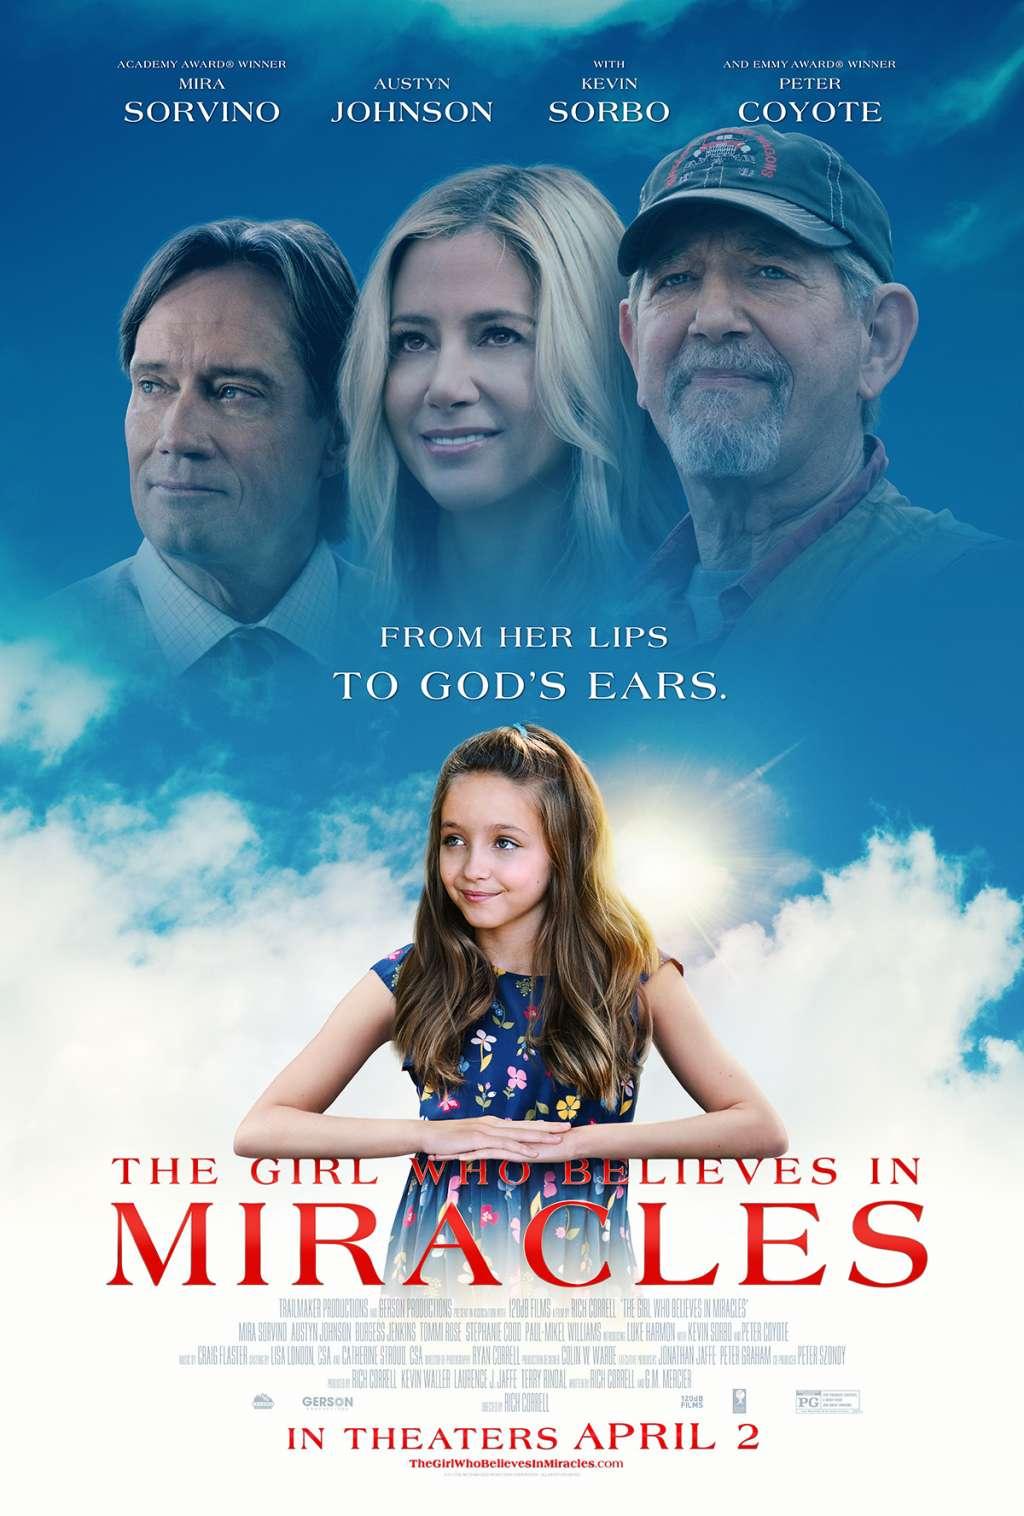 The Girl Who Believes in Miracles kapak